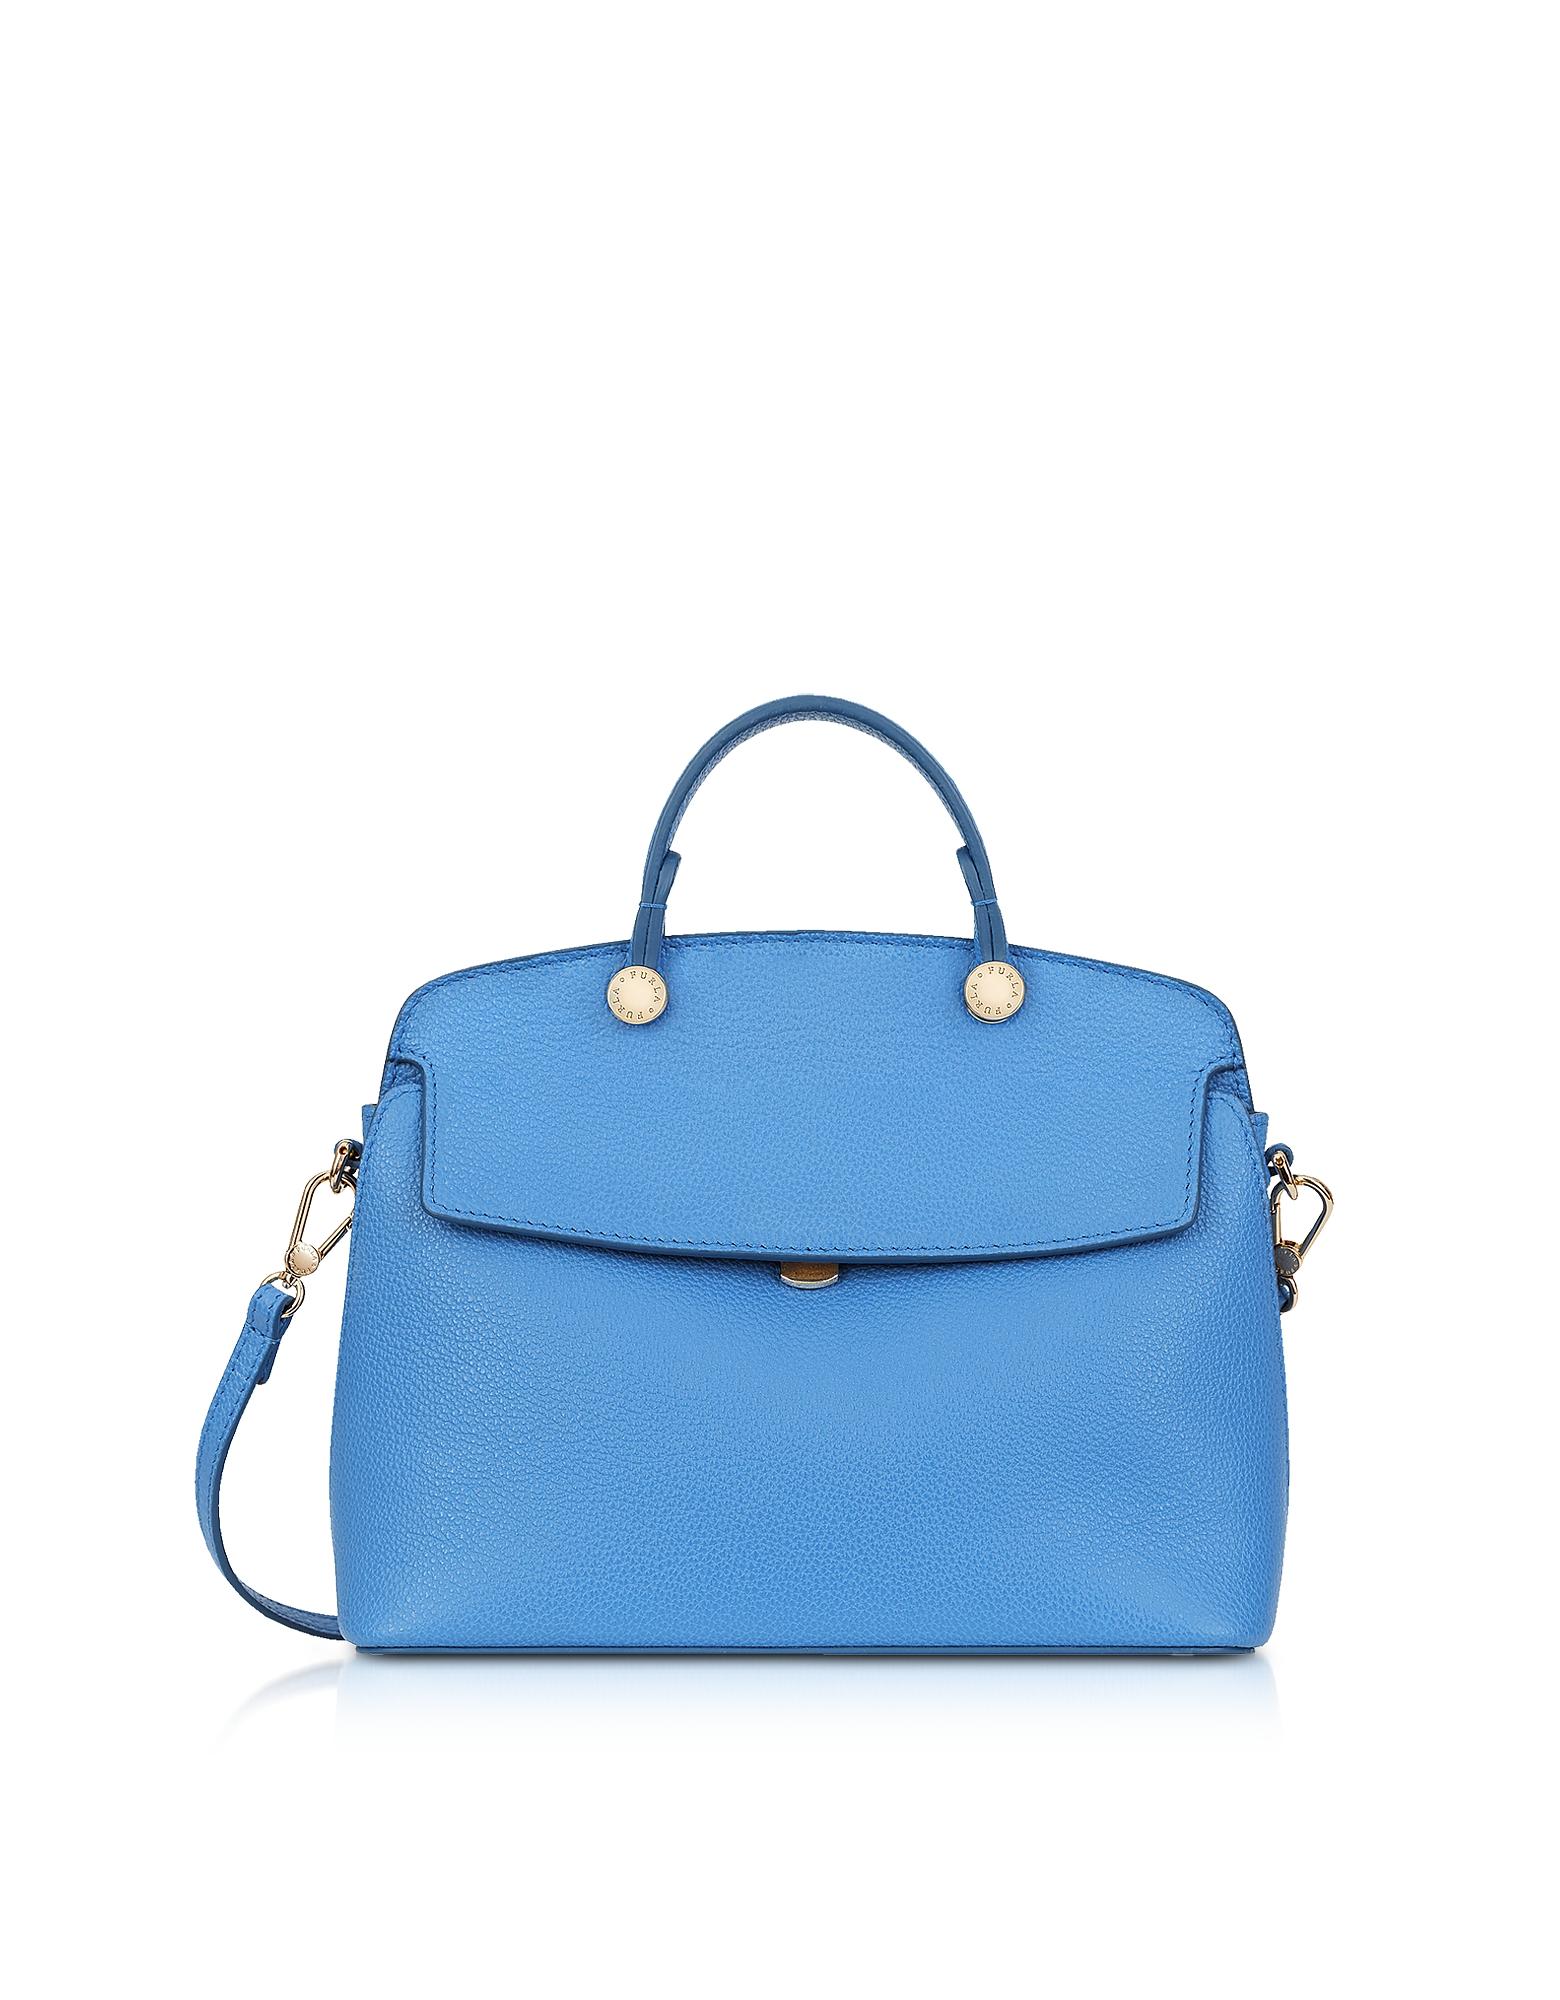 Furla Handbags, Celeste Leather My Piper Small Satchel